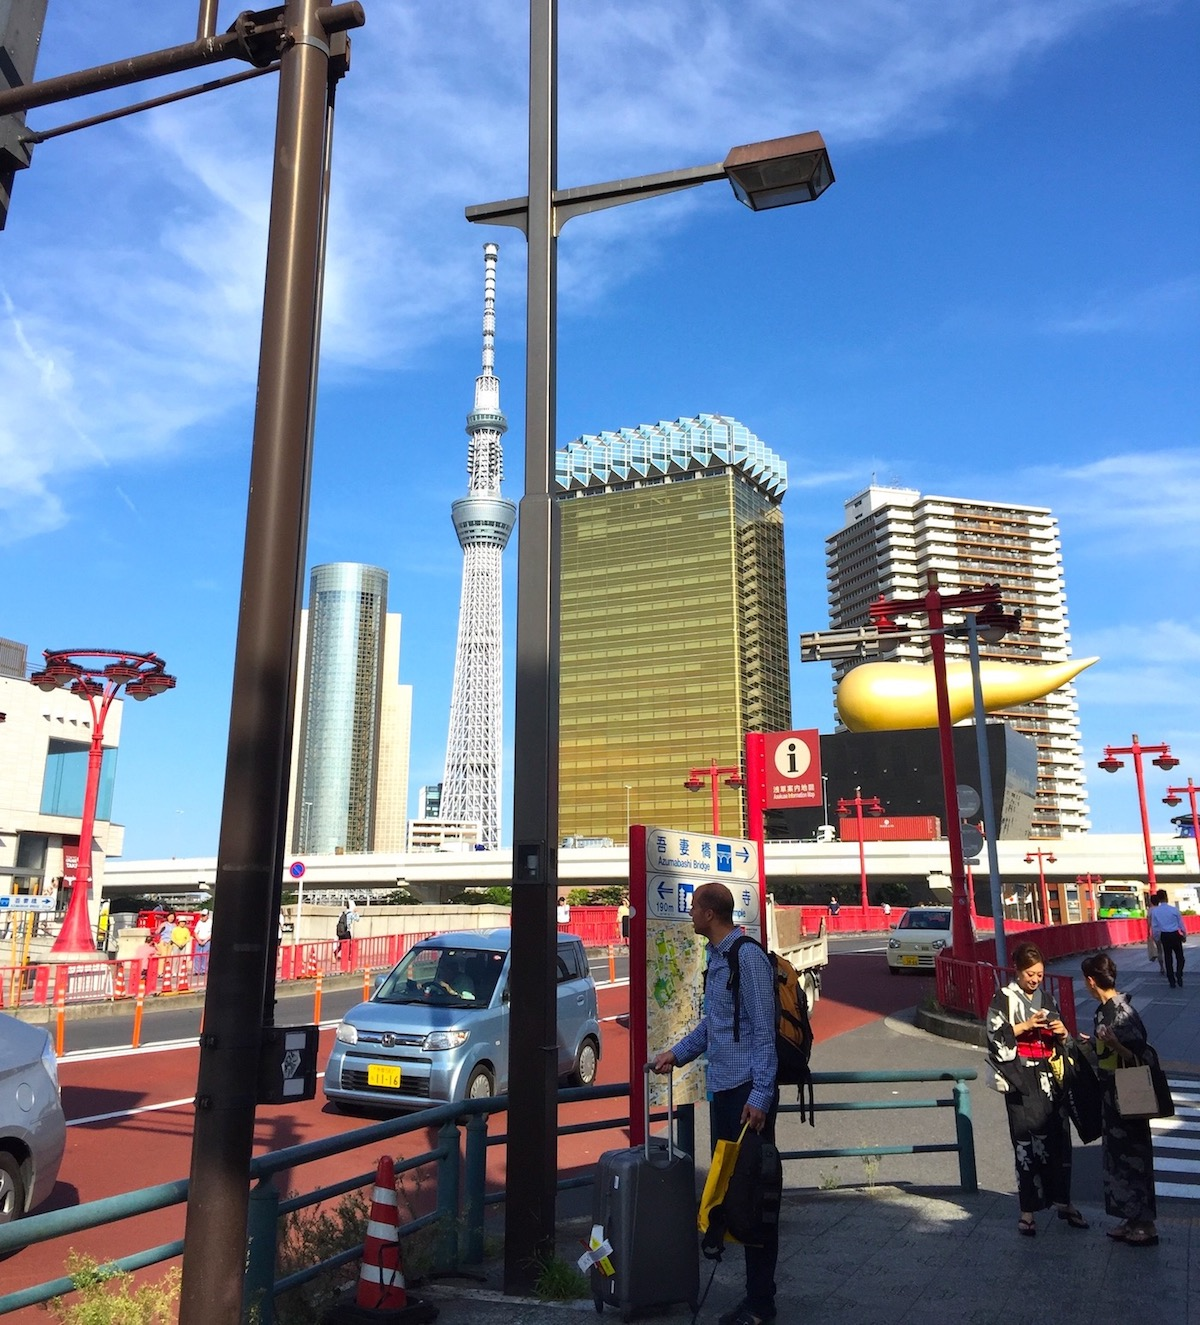 Lost in translation in Asakusa. Photo: Patti Neves